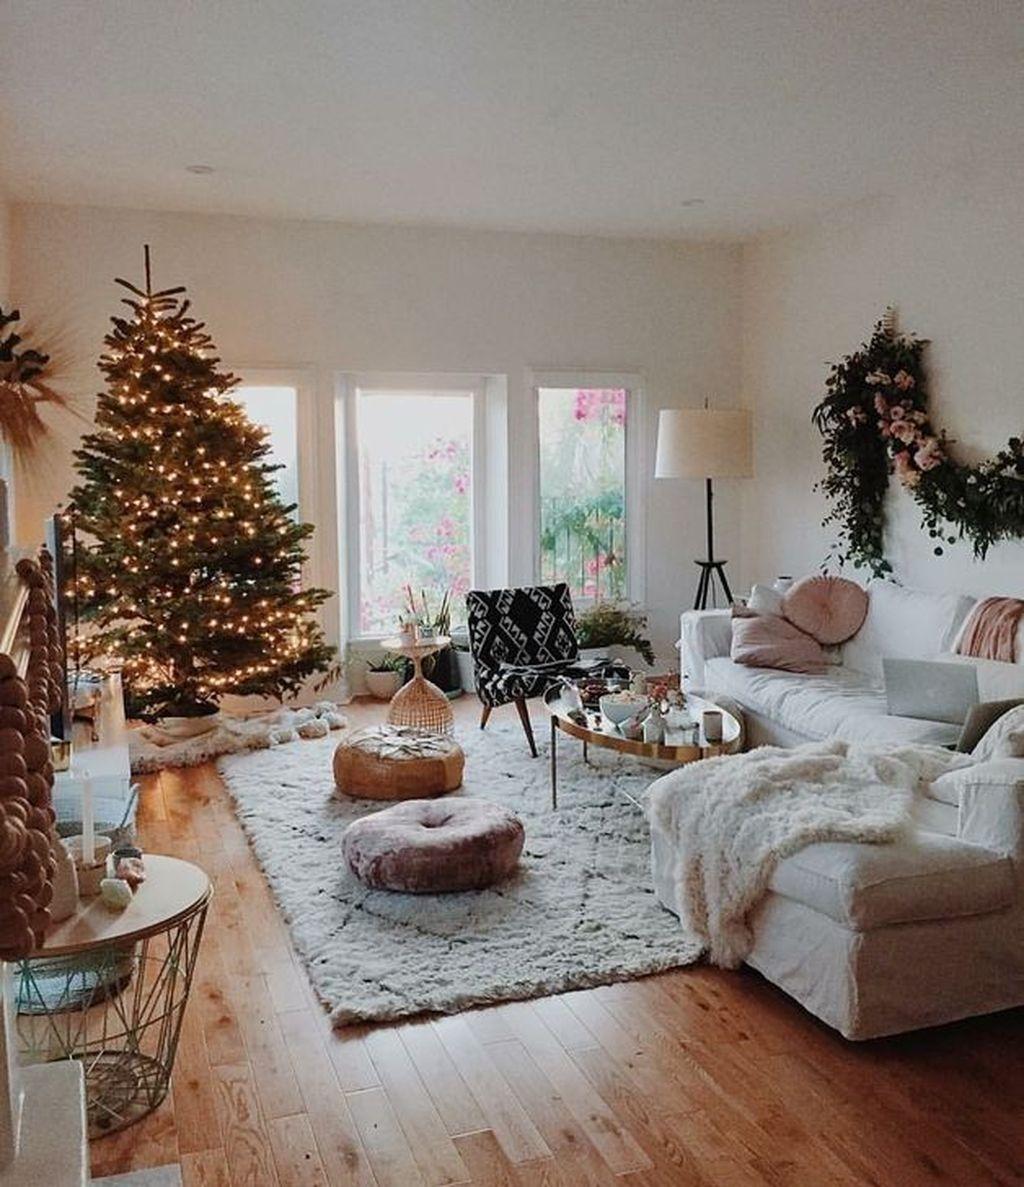 Cool 55 Small Apartment Christmas Tree Living Room Decor ...